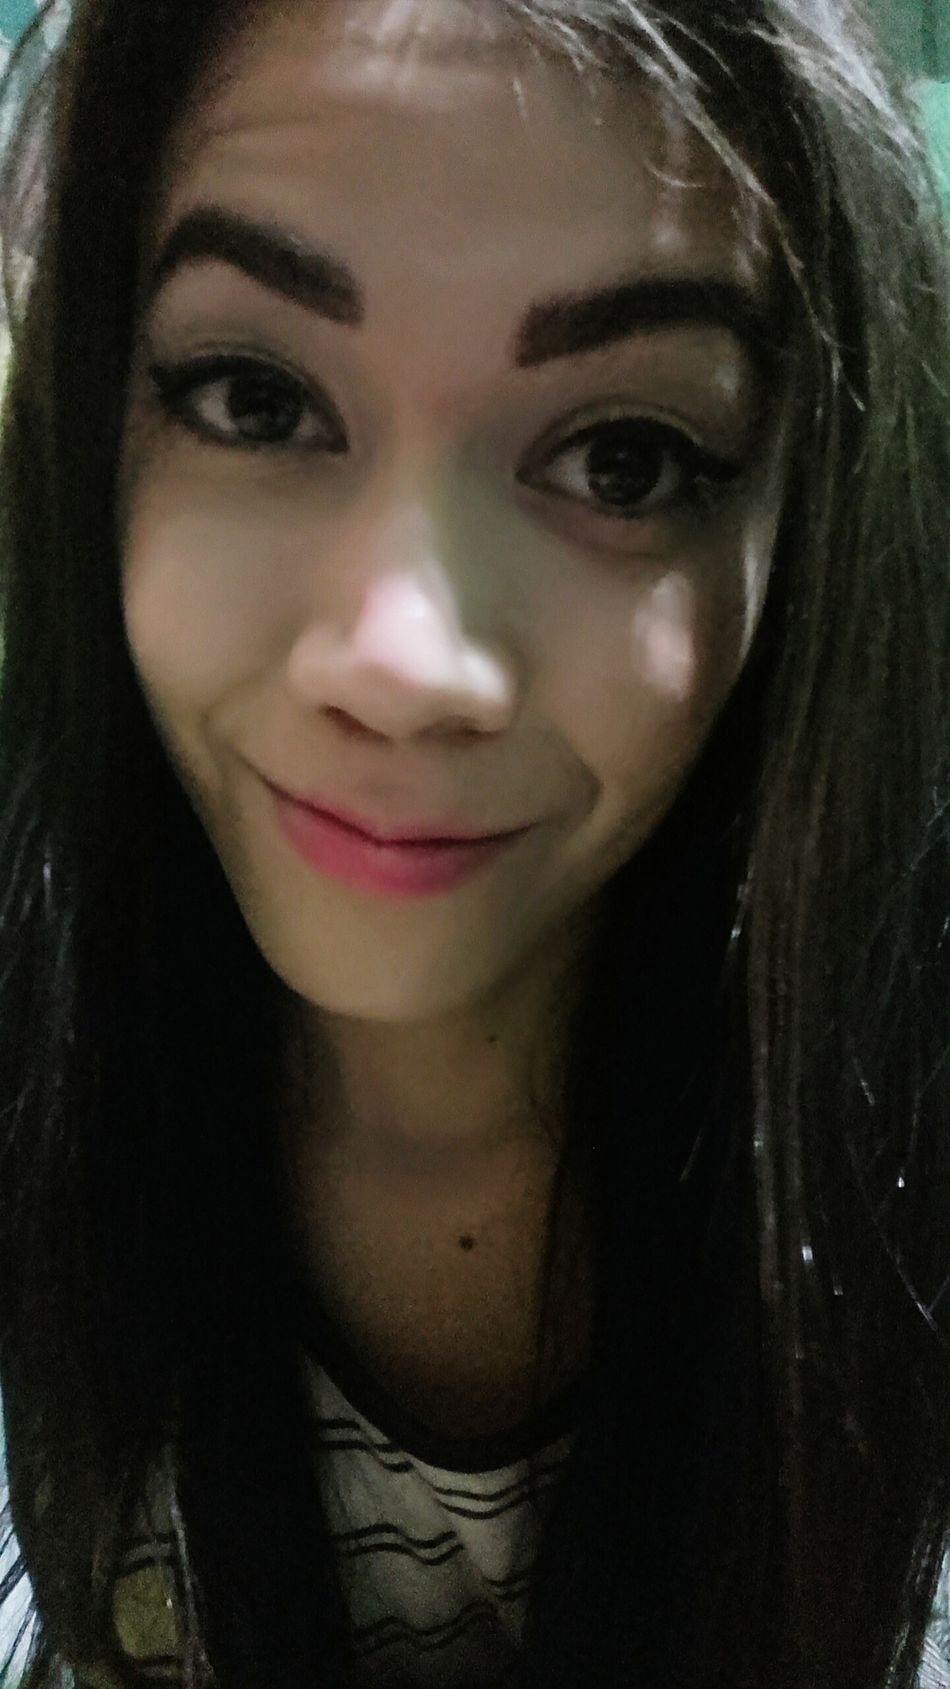 Salvadorean Girl♡ Taking Photos Hello World ✌ Selfietime My Eyes That's Me Cute♡ Lovely Hello World Pretty♡ Catita♡ Relaxing Enormemente Feli!